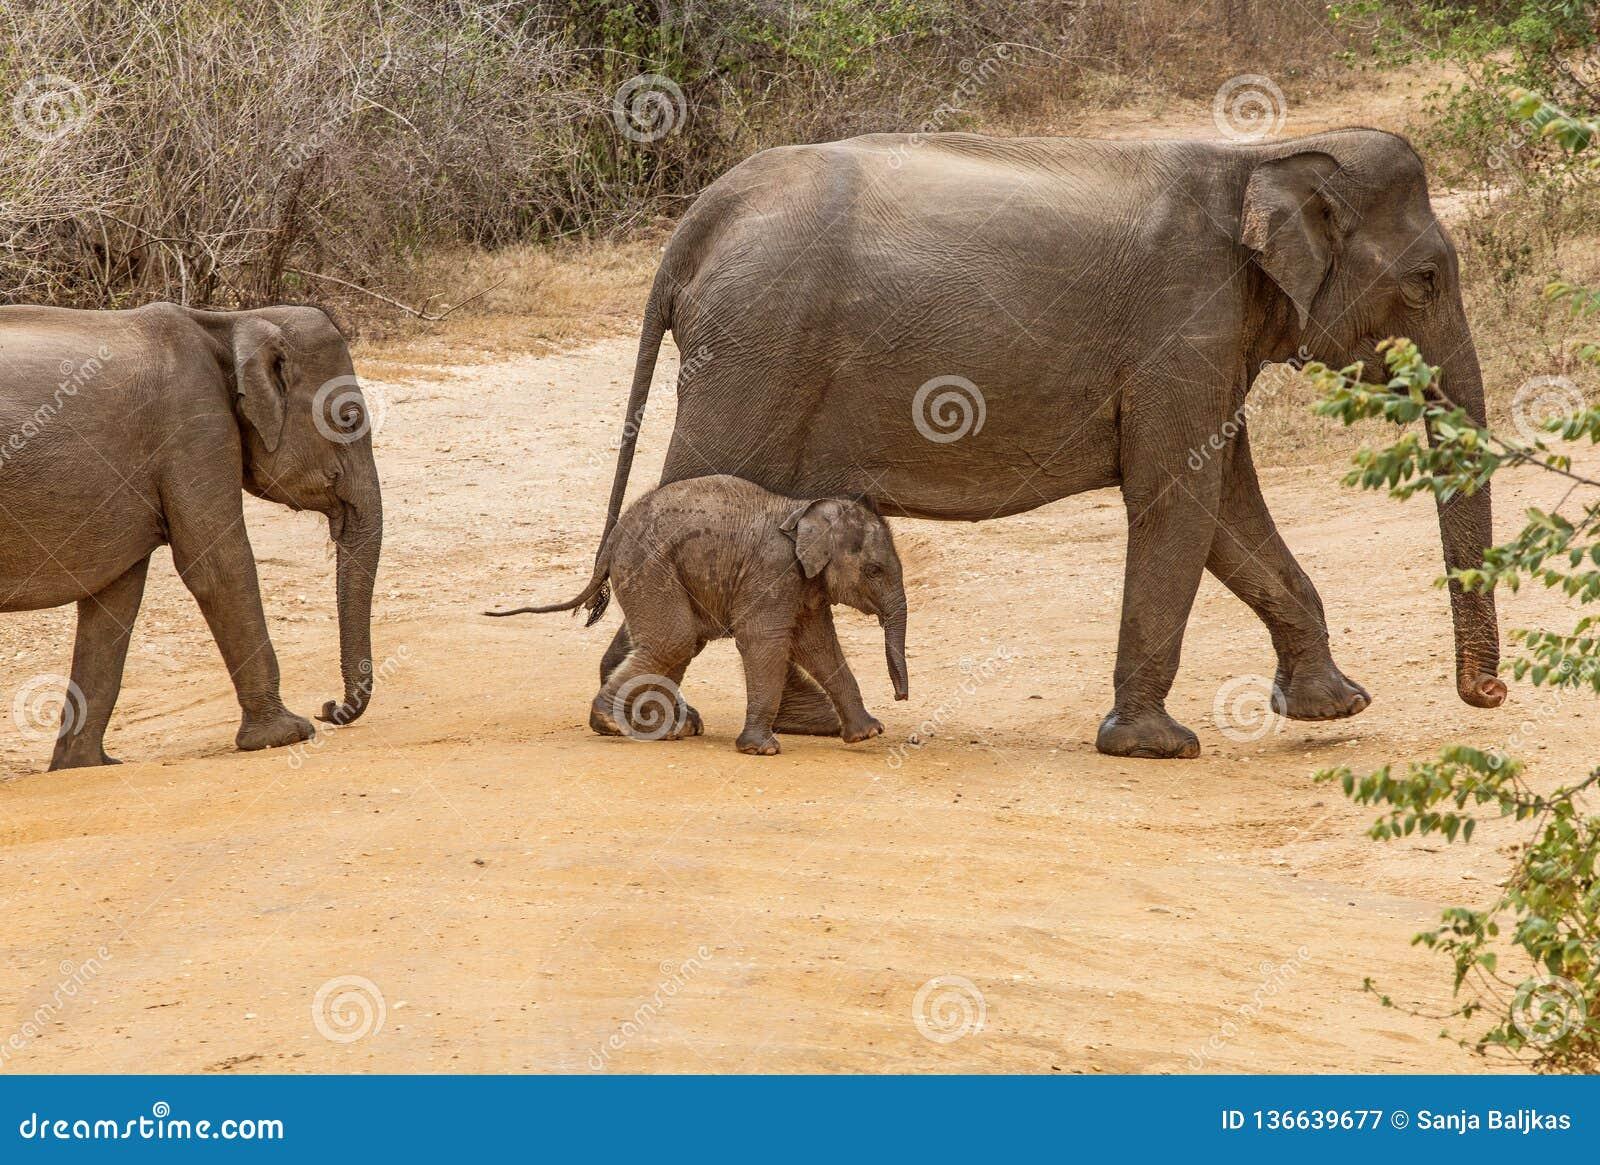 Mom Elephant with Baby in Sri Lanka